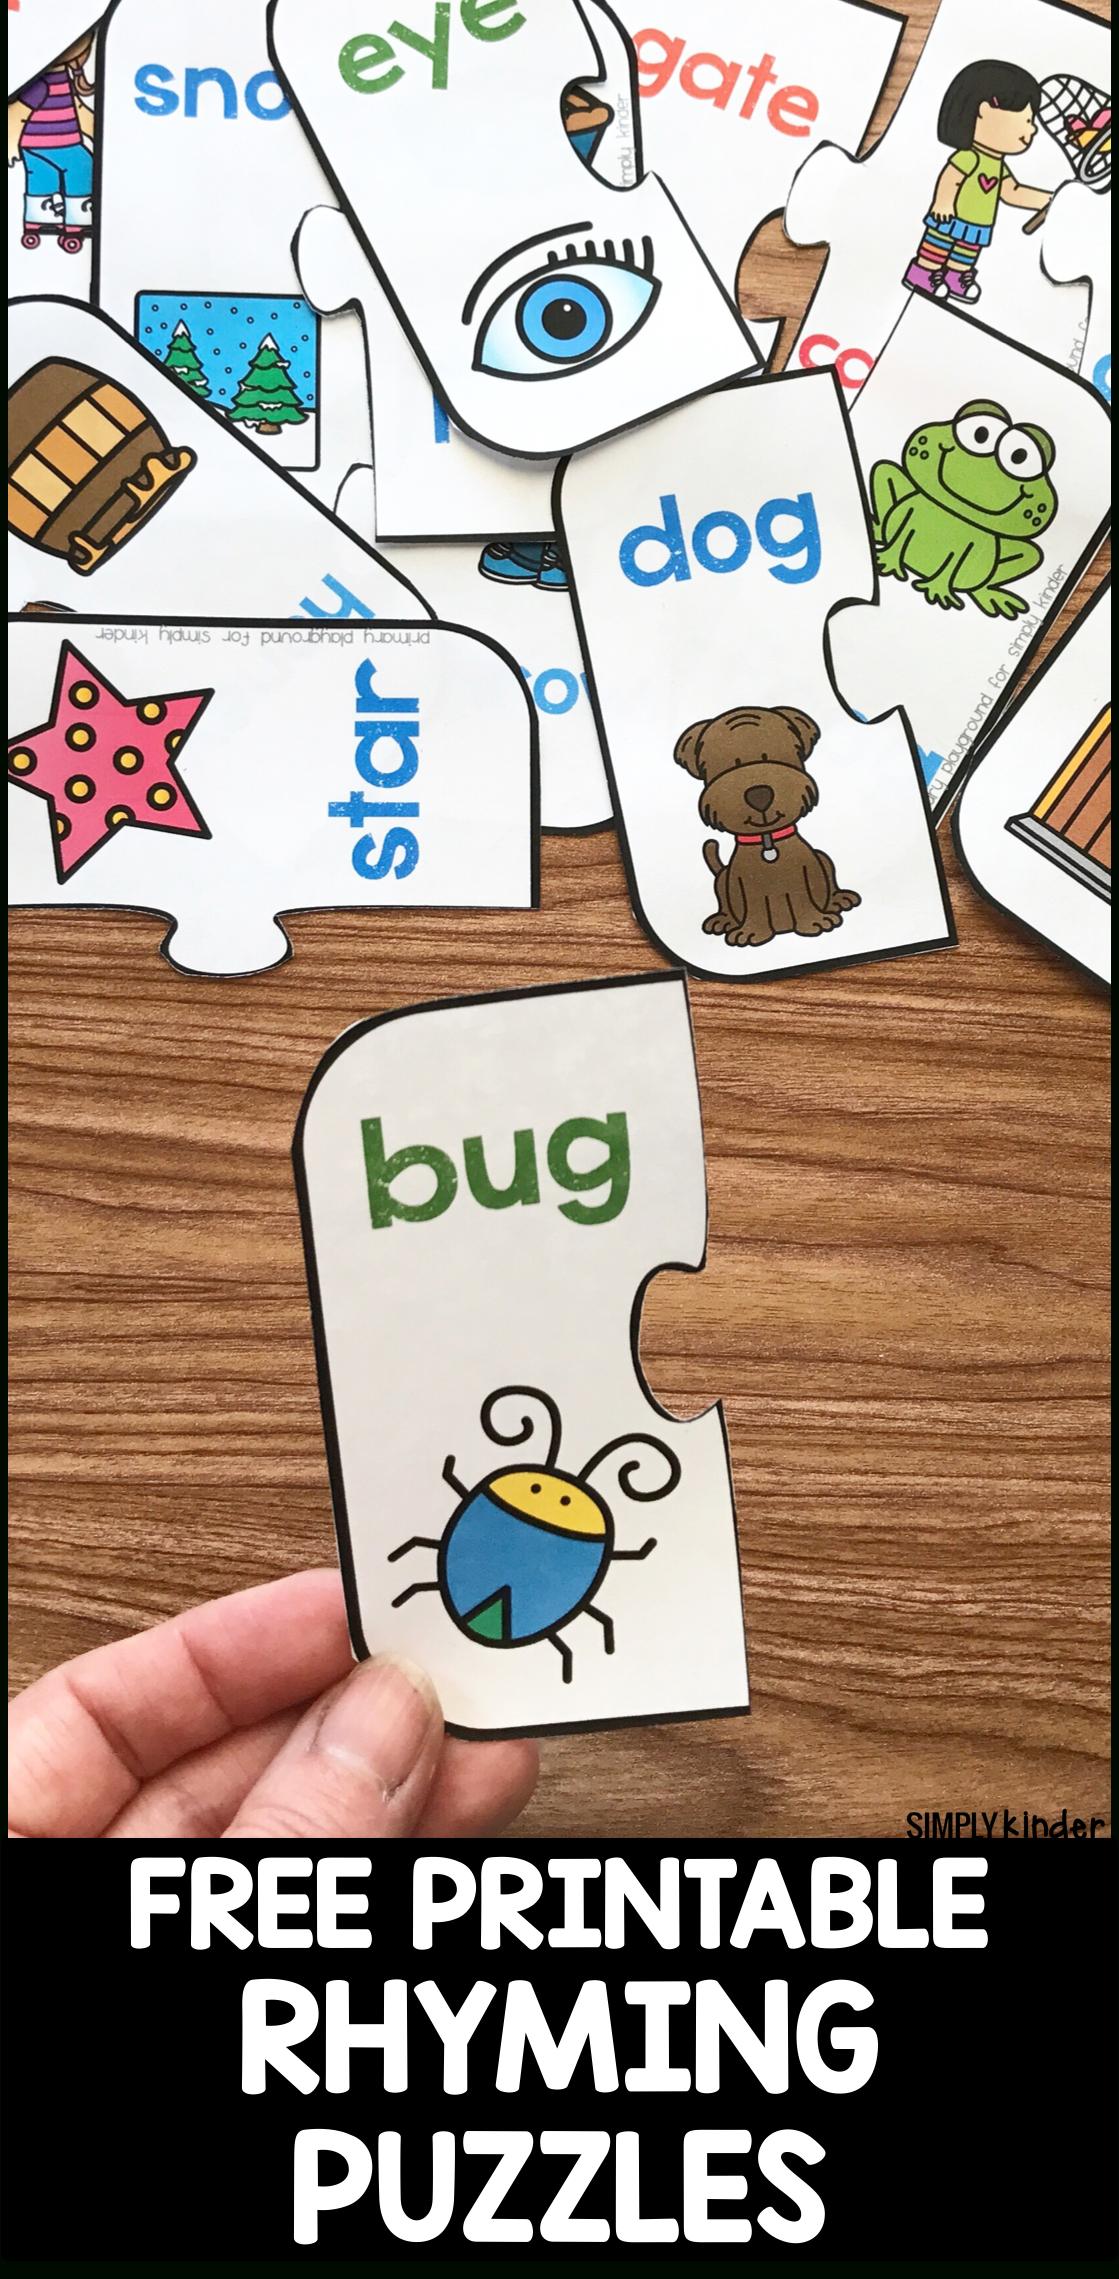 Free Printable Rhyming Puzzles - Simply Kinder - Printable Puzzles Kindergarten